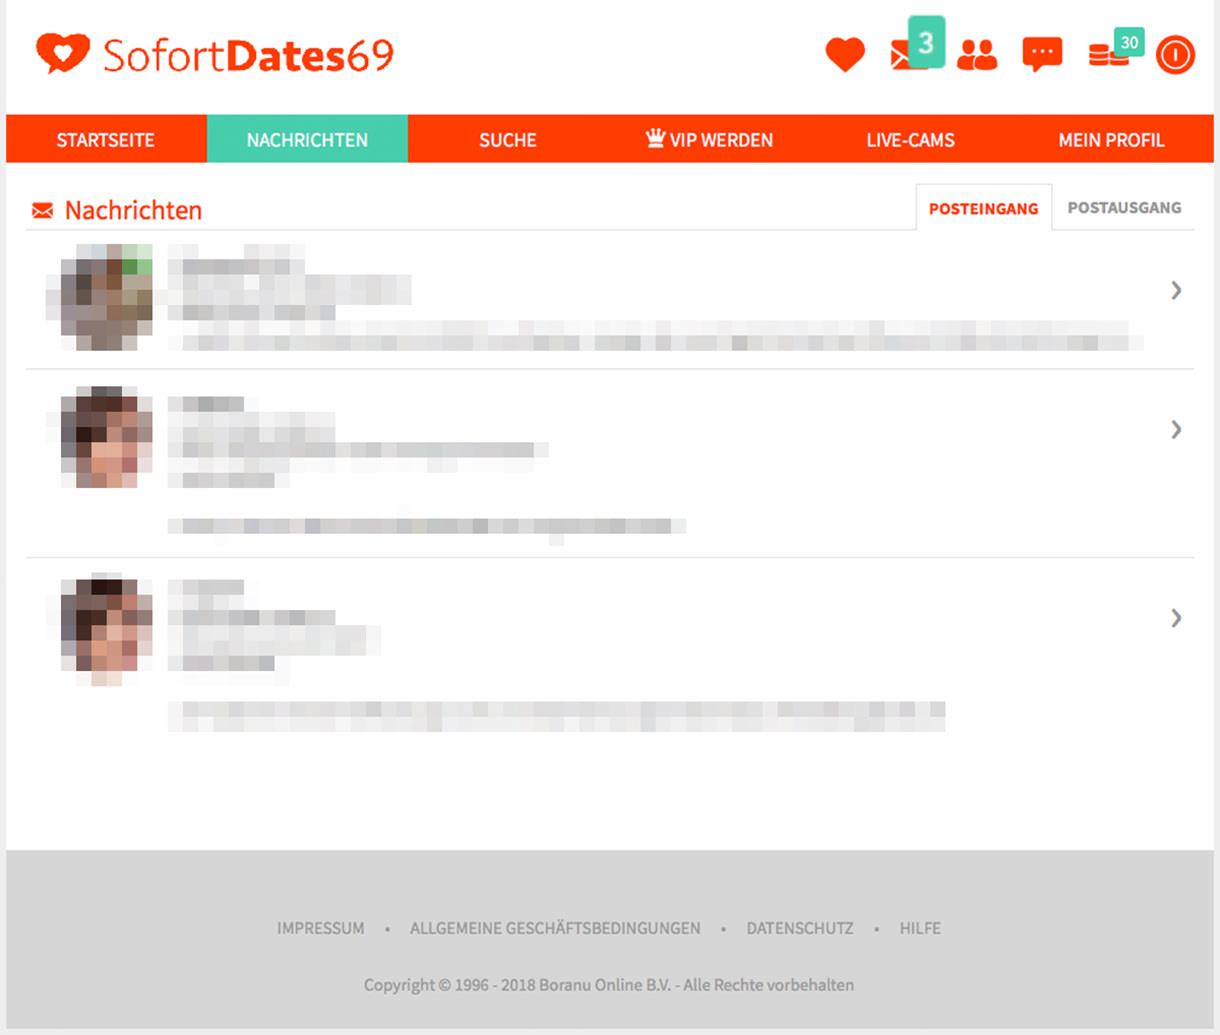 Sofortdates69 Message Center